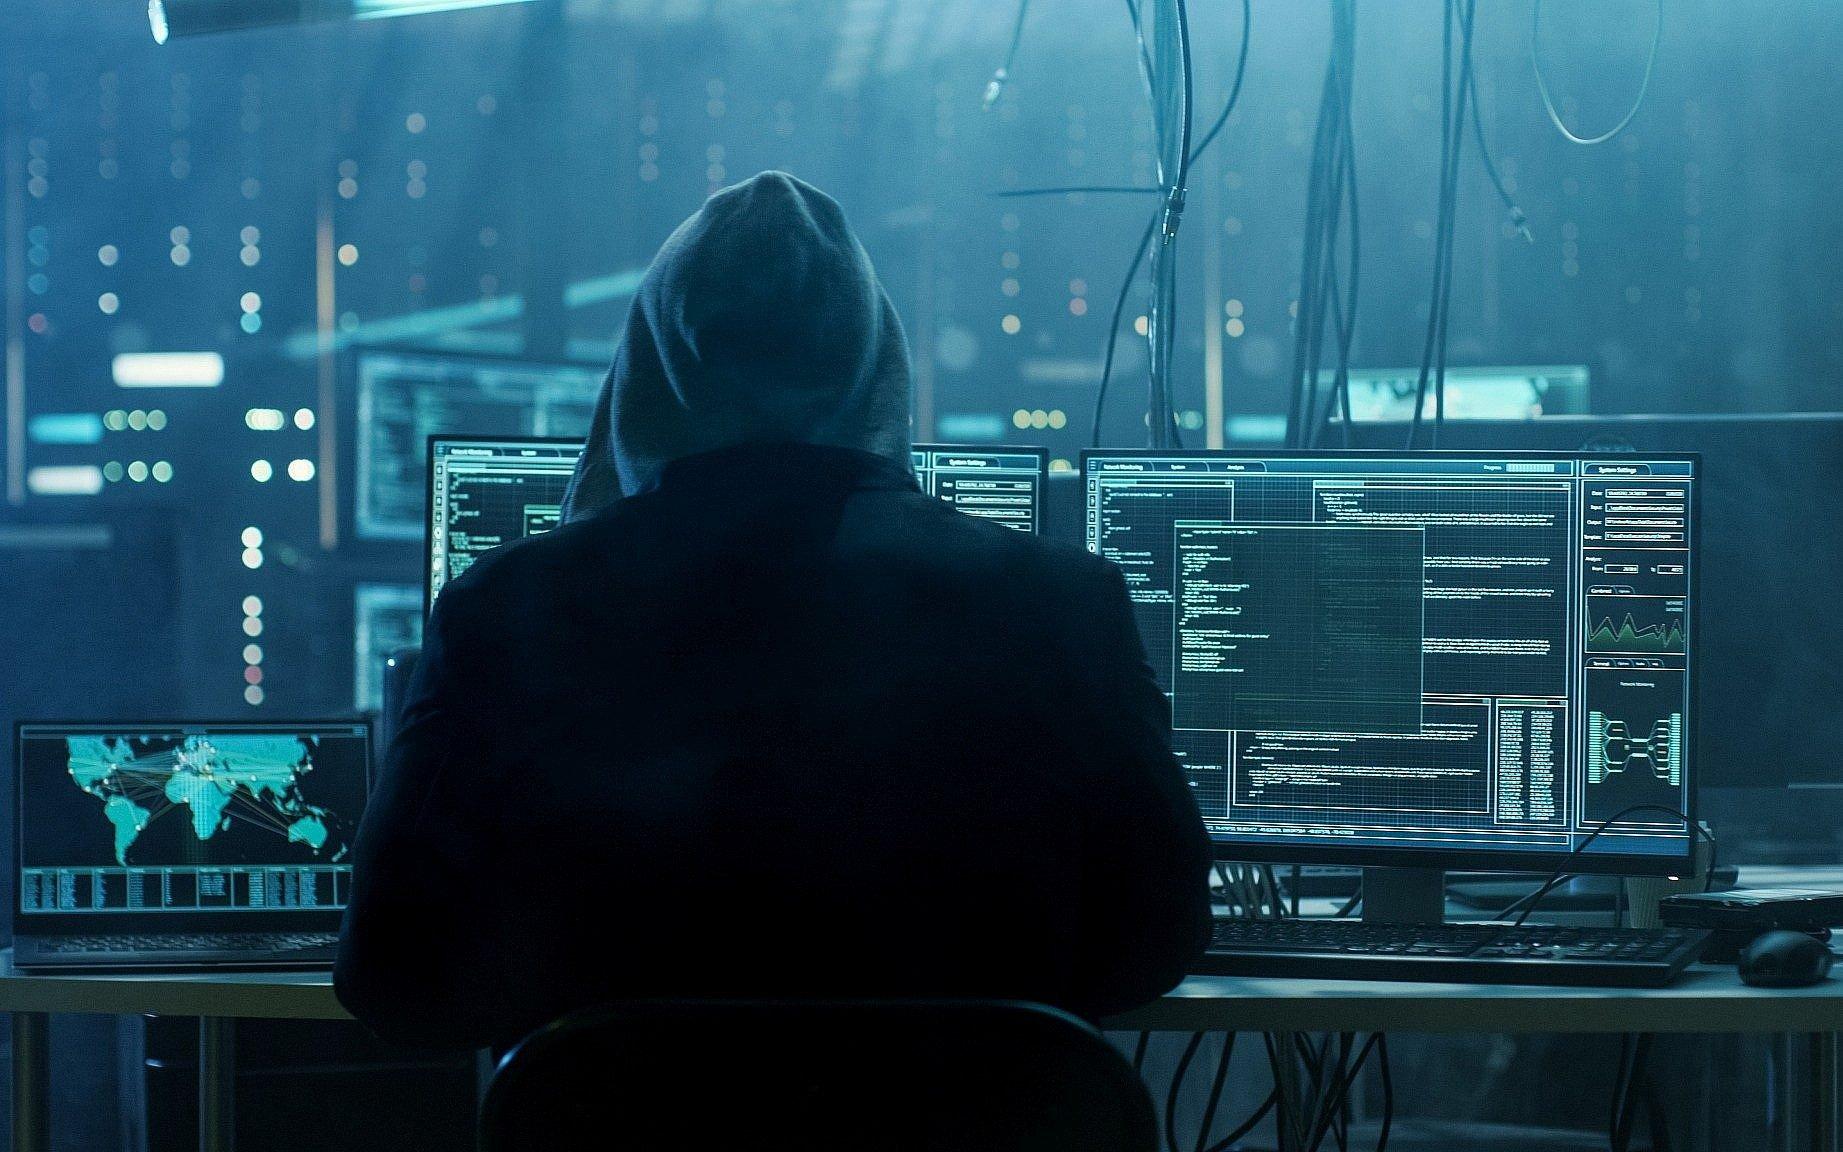 hacker - SolarWinds Οι hackers έκλεψαν πηγαίο κώδικα της Microsoft